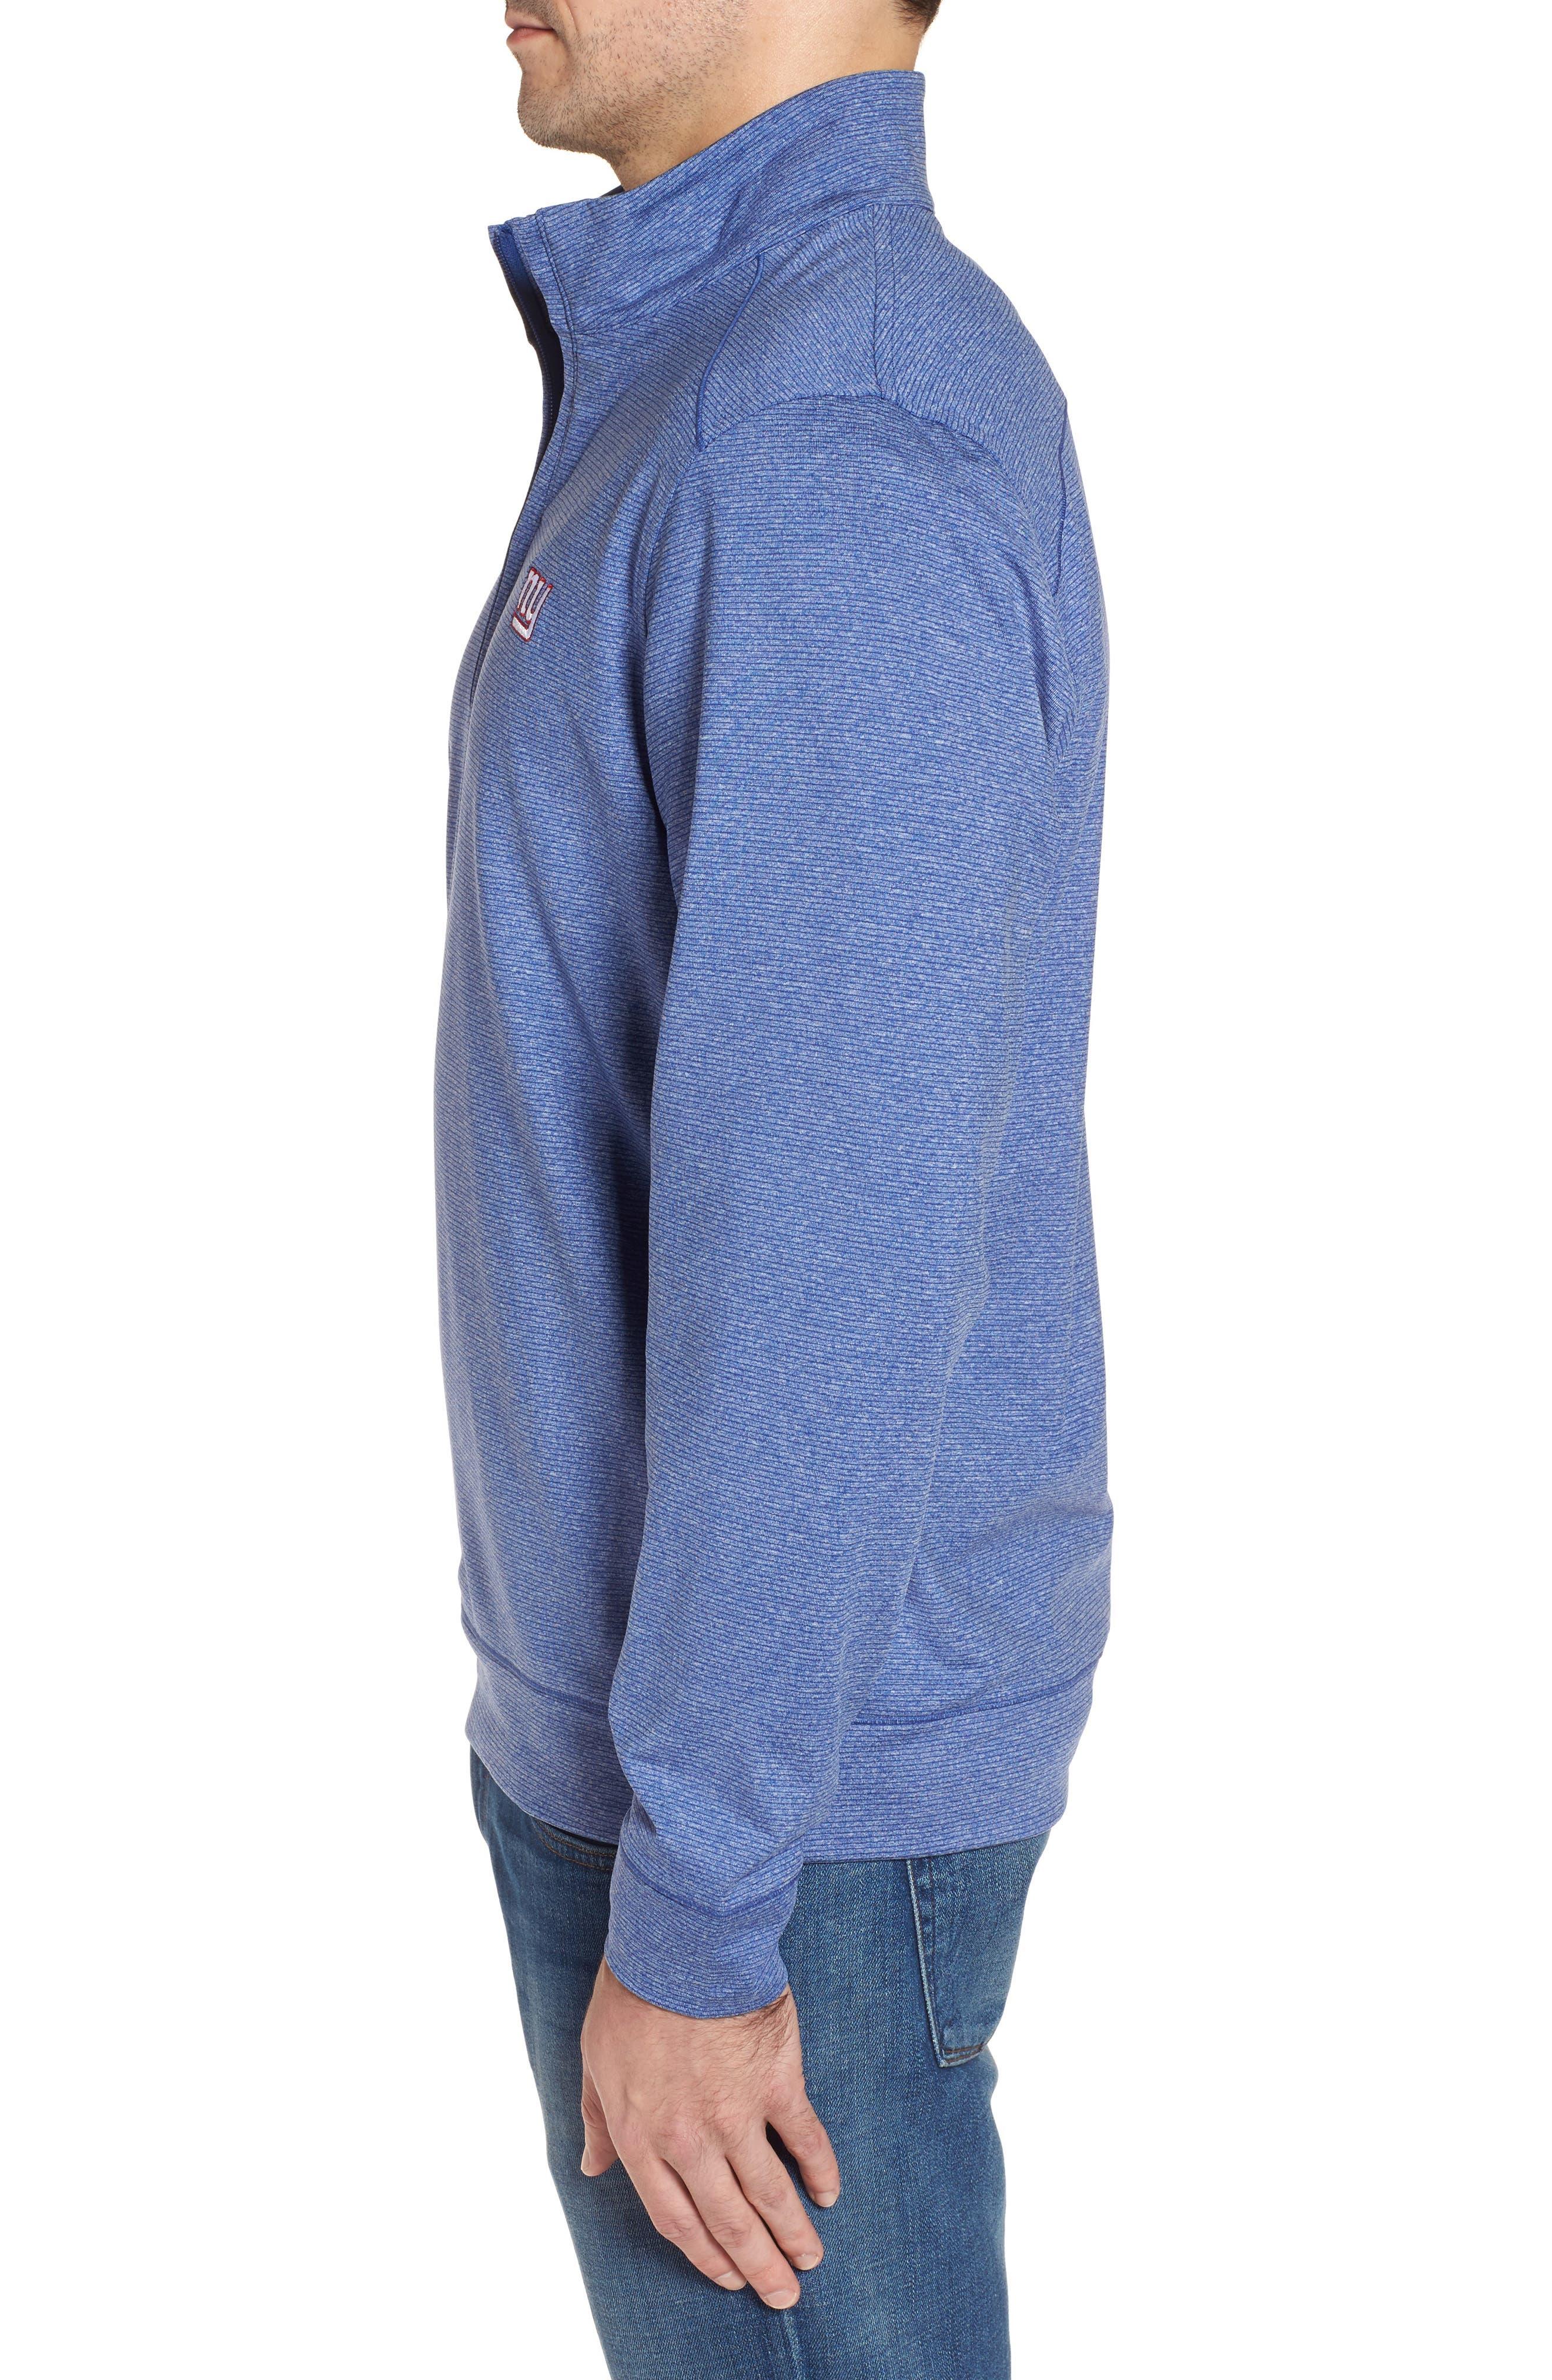 Shoreline - New York Giants Half Zip Pullover,                             Alternate thumbnail 3, color,                             425